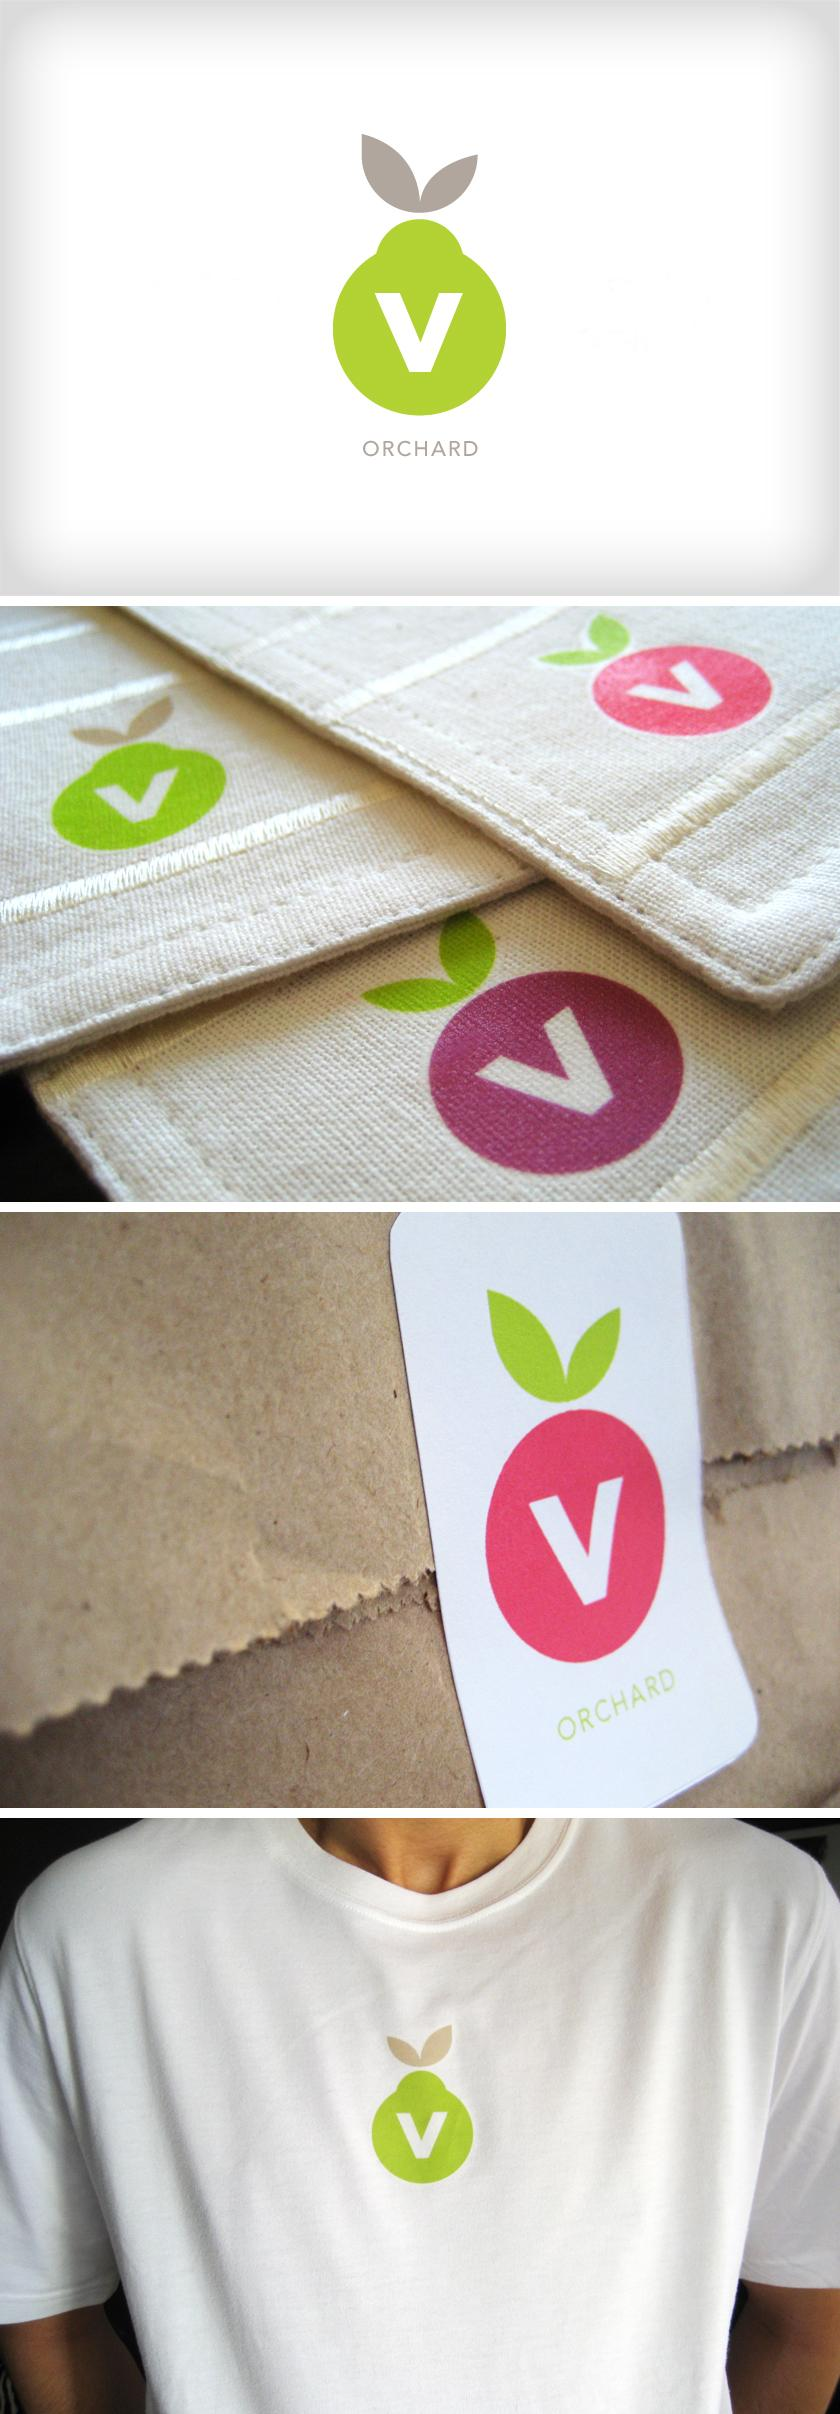 V-Orchard - Logos - Creattica